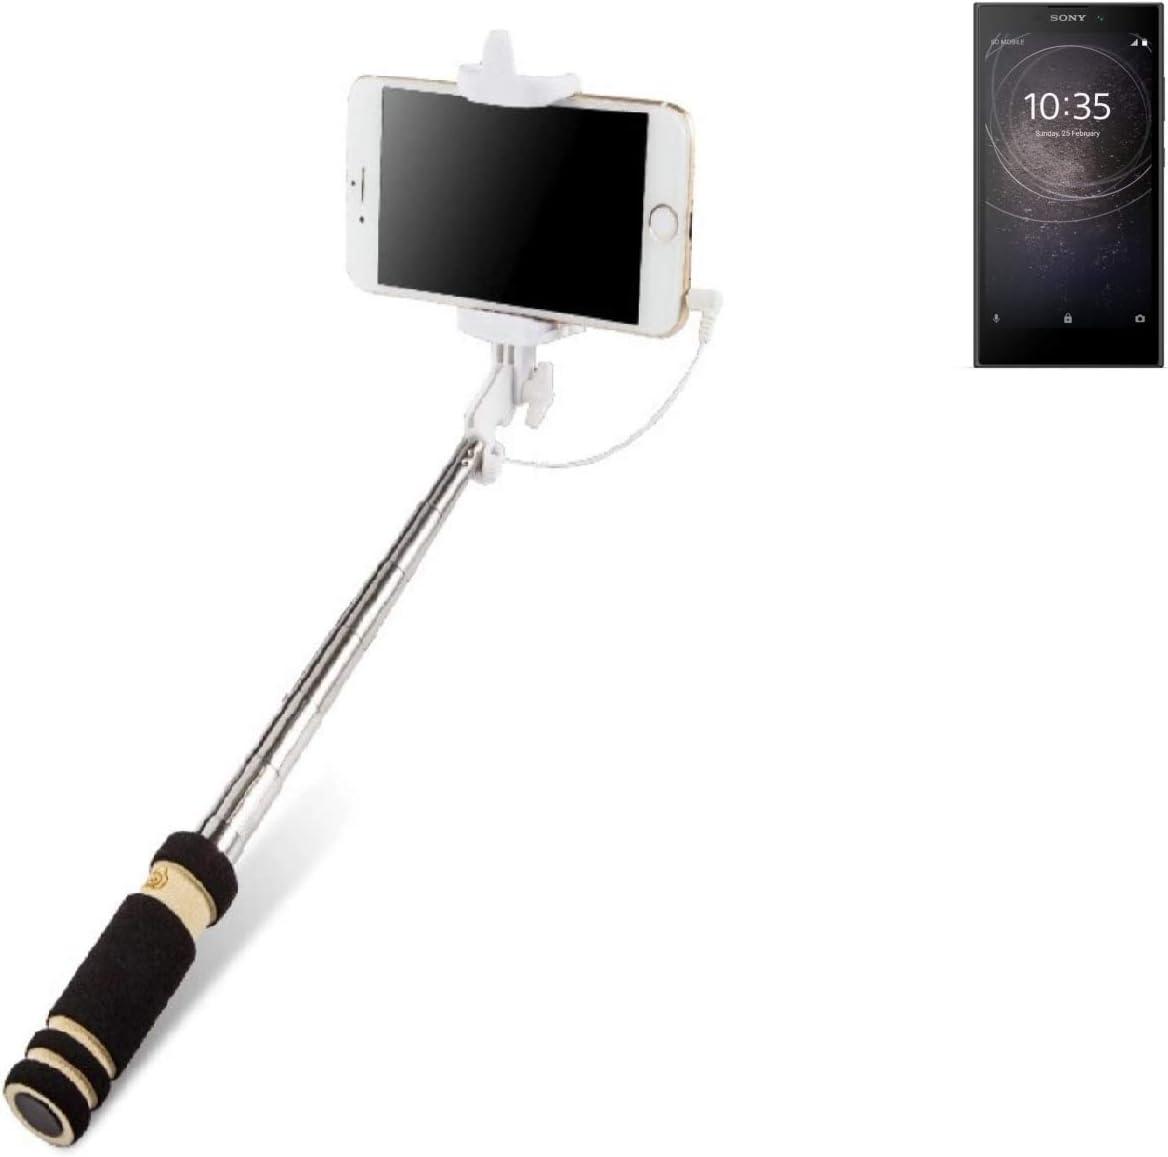 black Self Portrait wired Monopod Handheld Stick telescopic pole for Sony Xperia L2 K-S-Trade Selfie Stick e.g